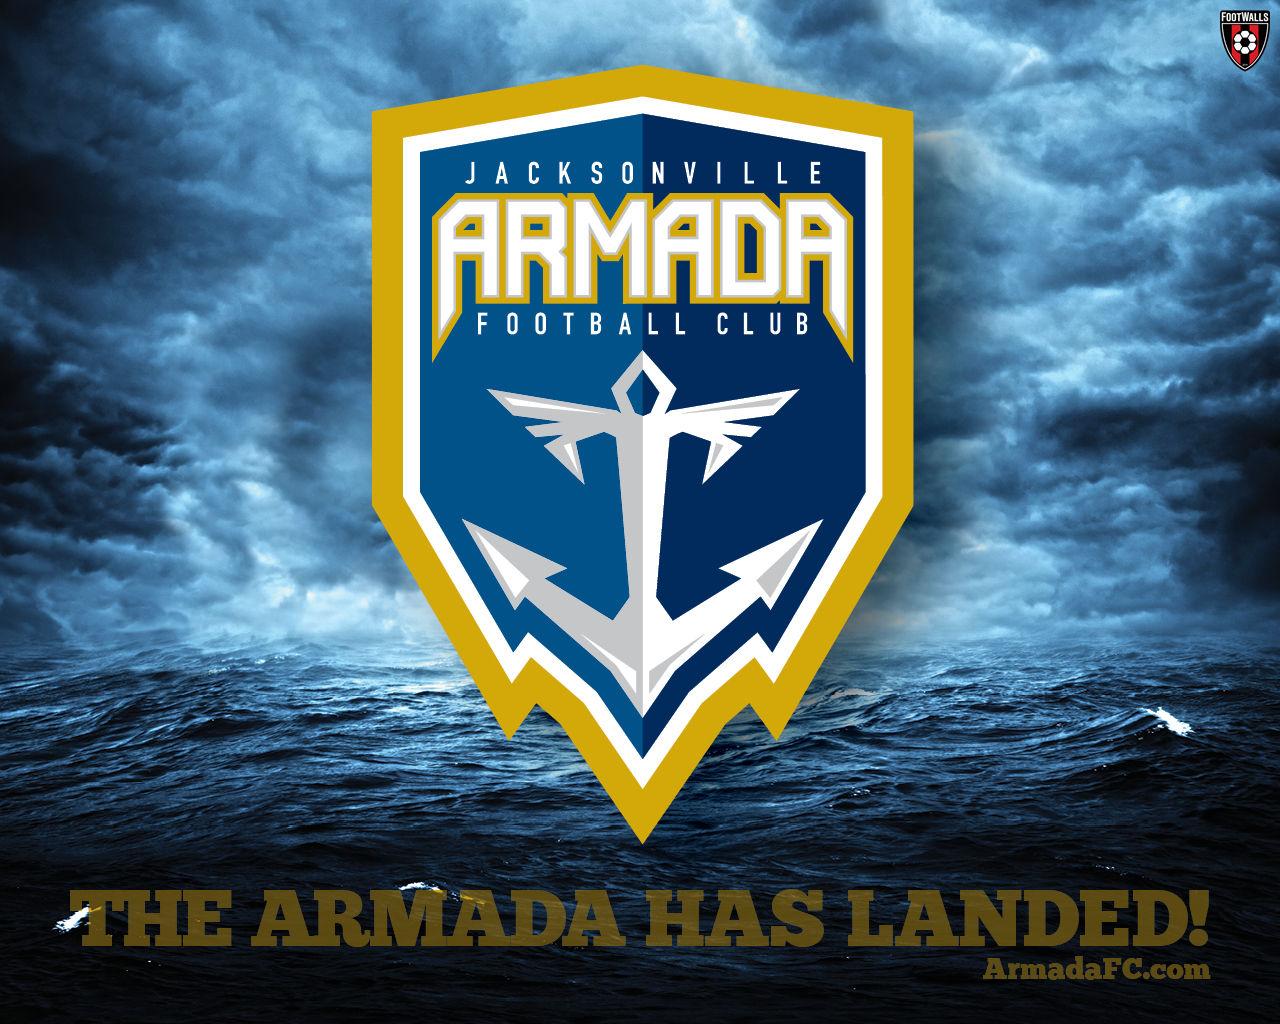 Jacksonville Armada Wallpaper 1   Football Wallpapers 1280x1024